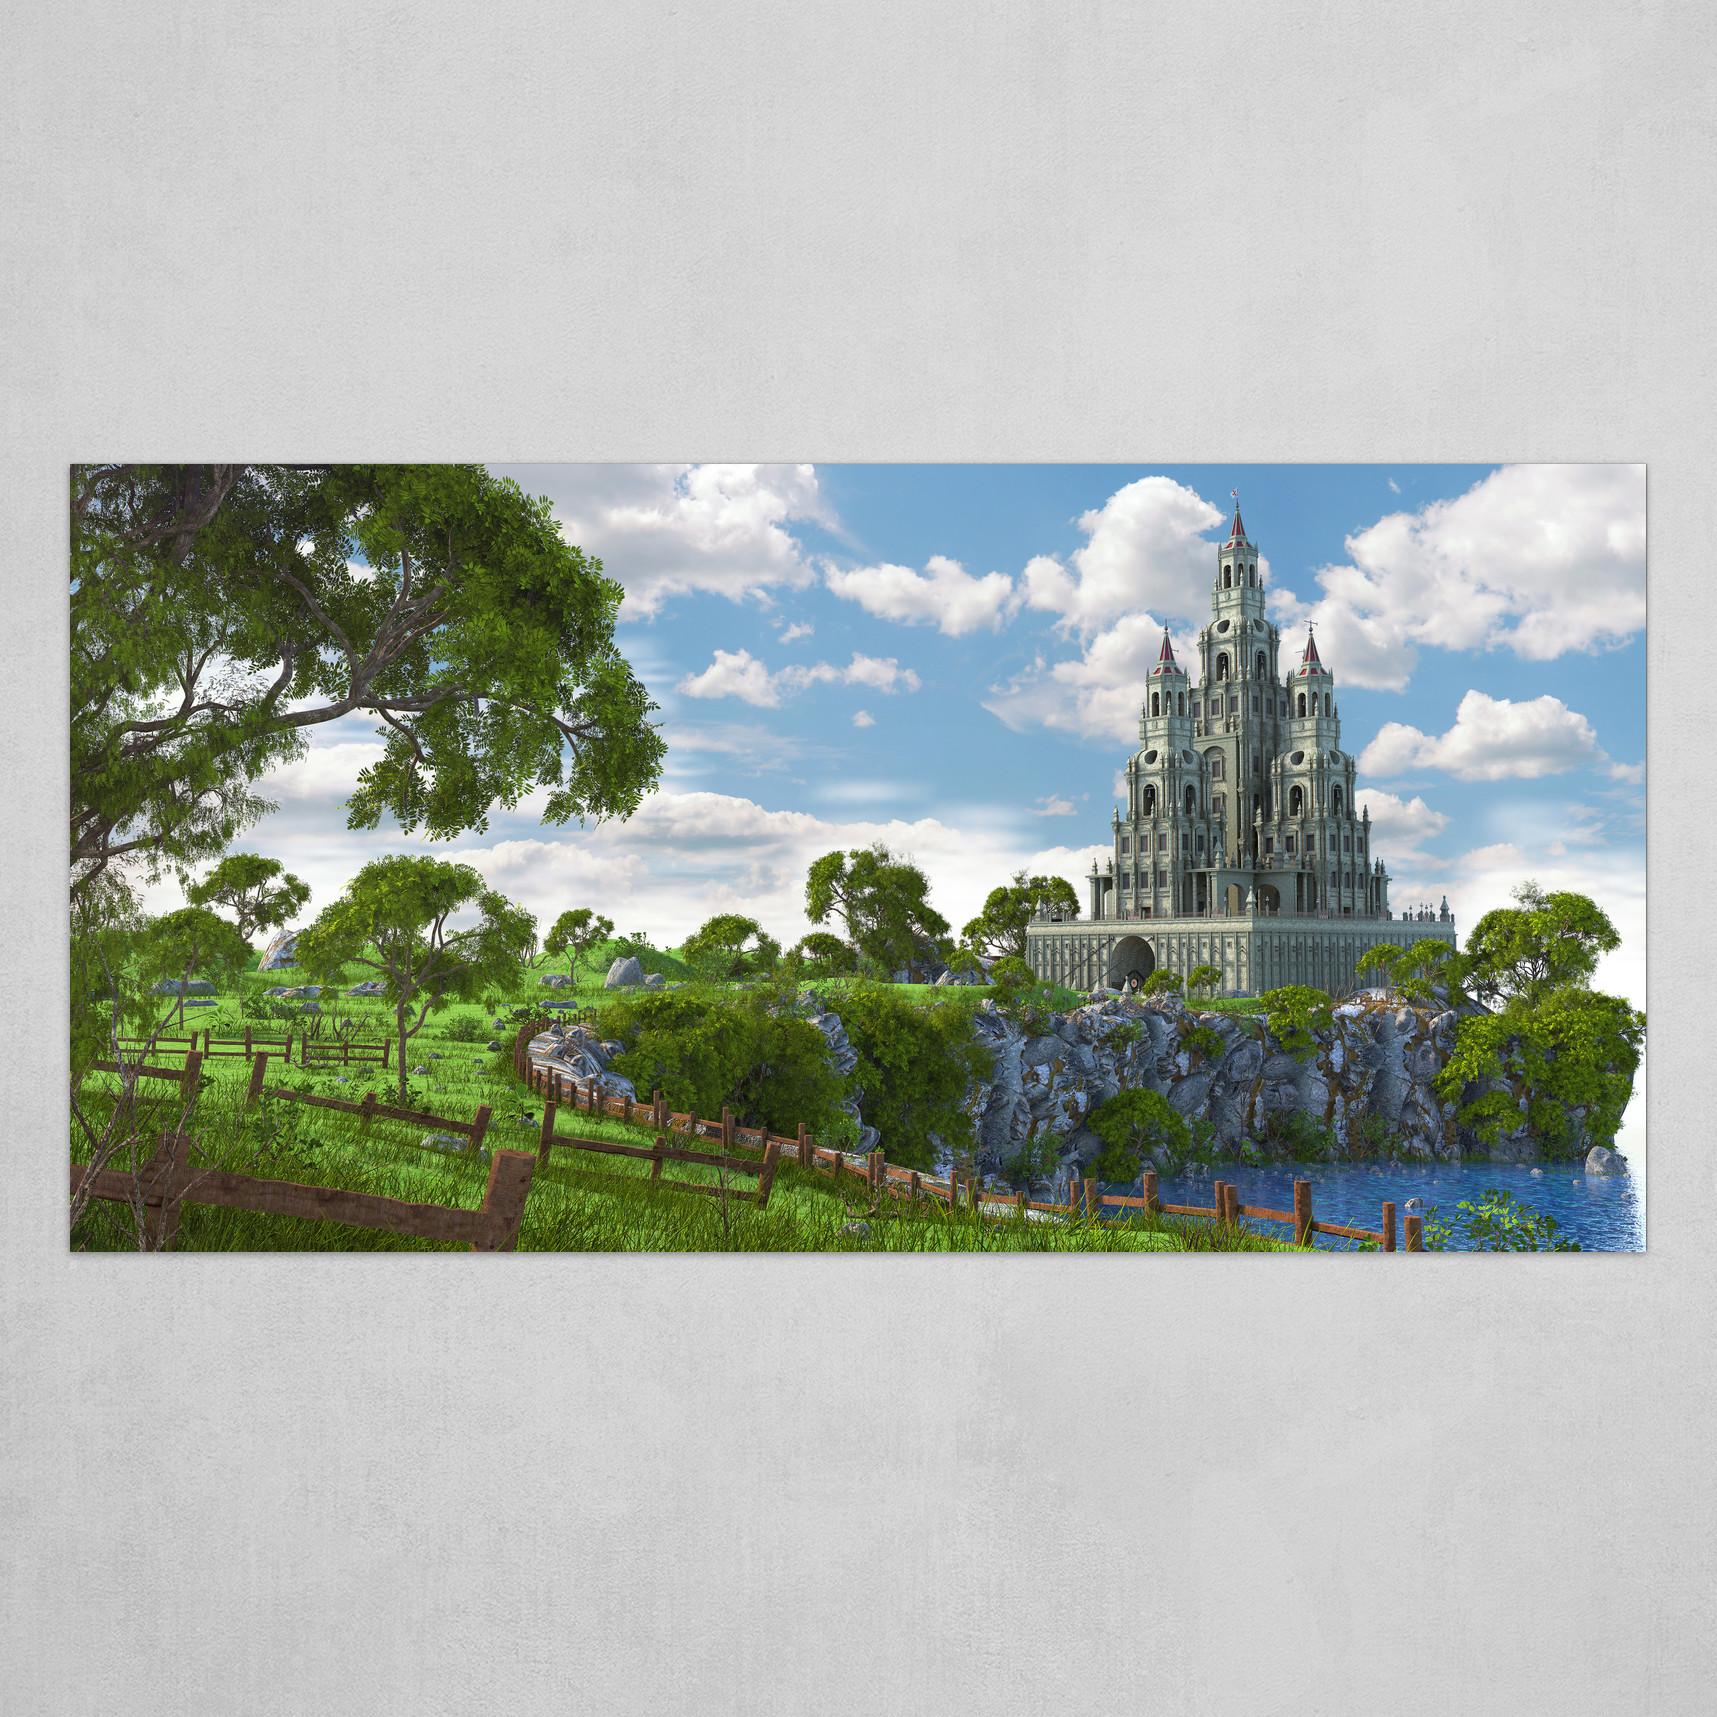 Fantasy Castle V3